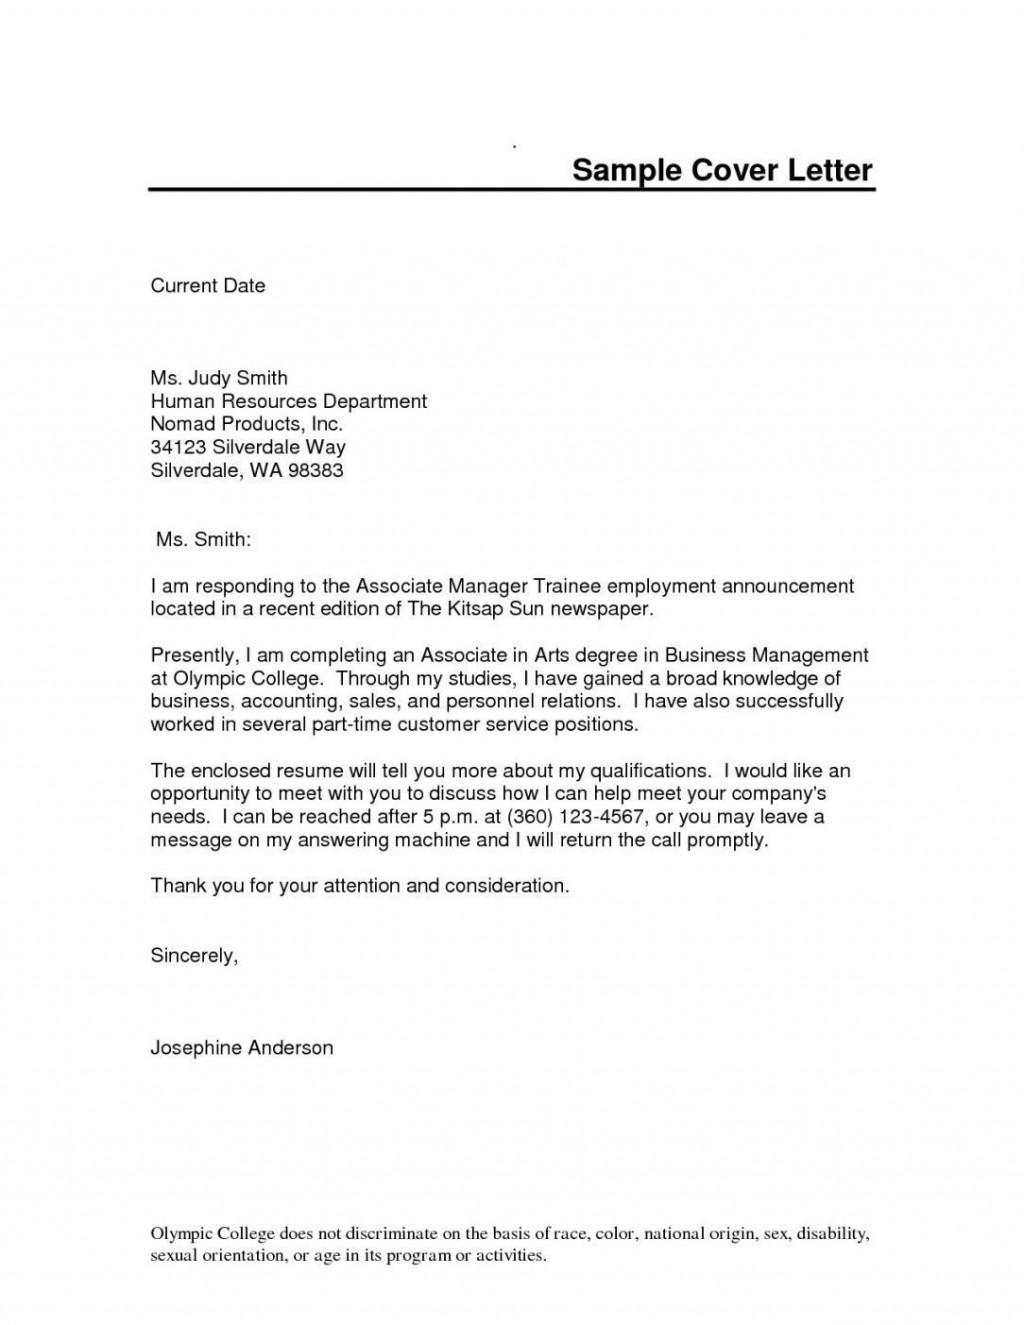 000 Fascinating Letter Template Microsoft Word Design  Naval Format 2010 2007Large